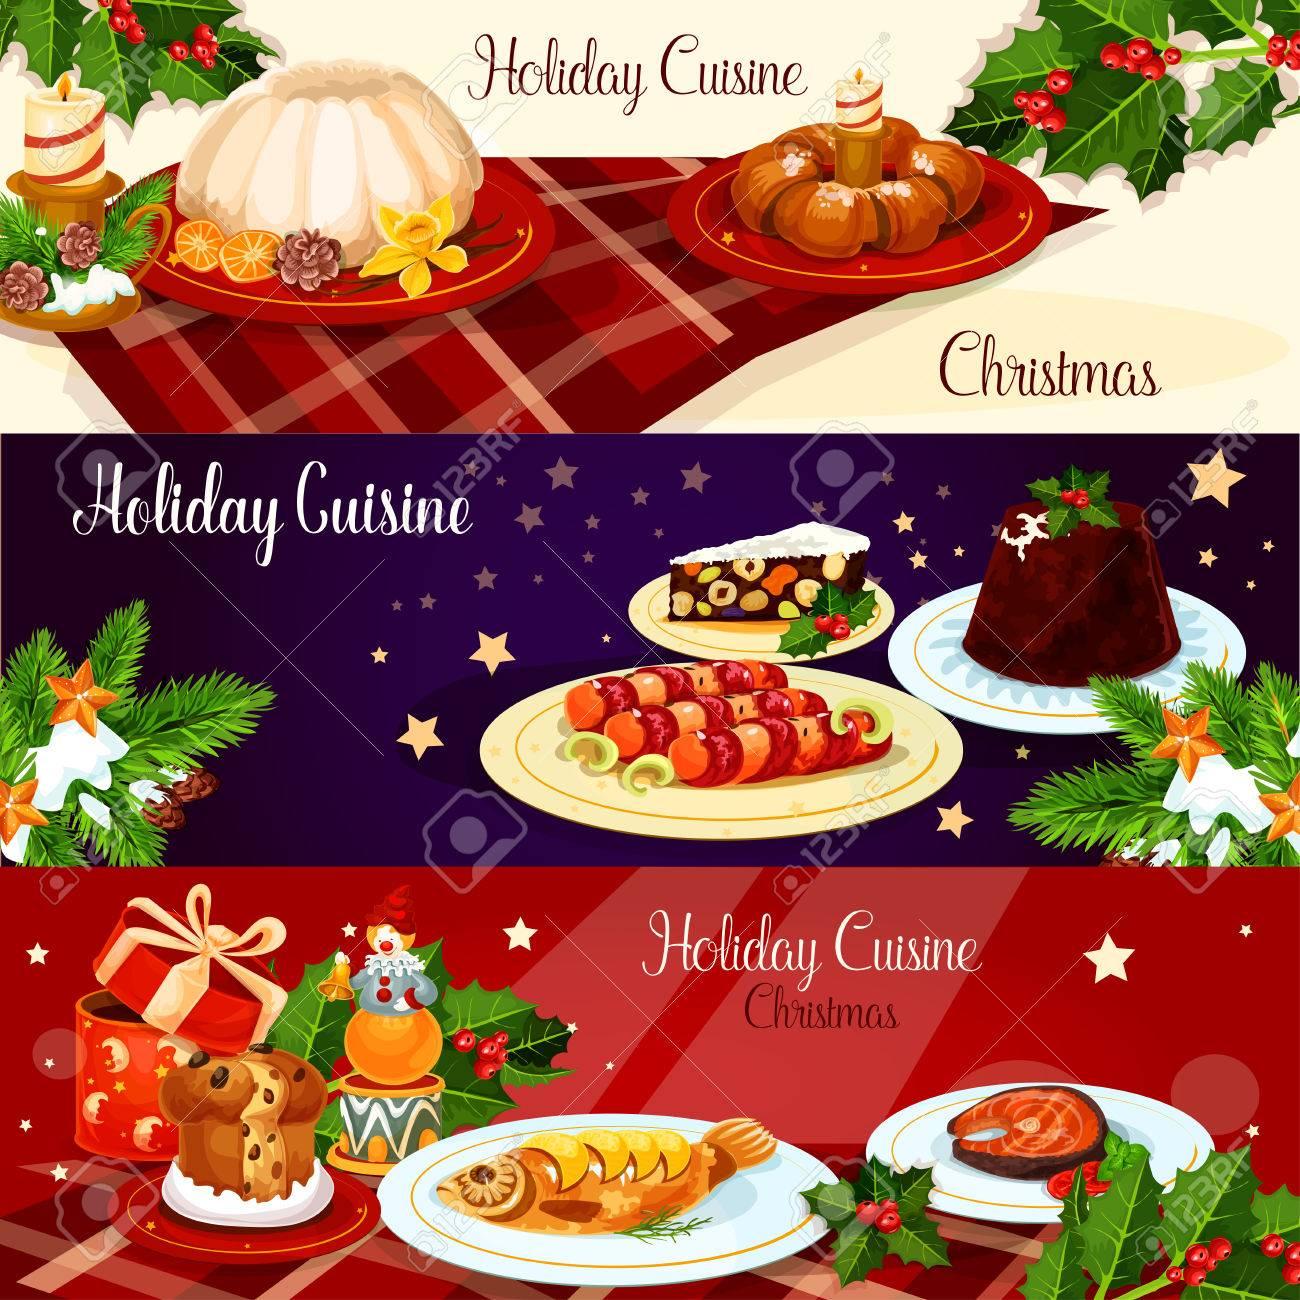 christmas holiday cuisine banner set british xmas pudding smoked salmon stuffed fish - British Christmas